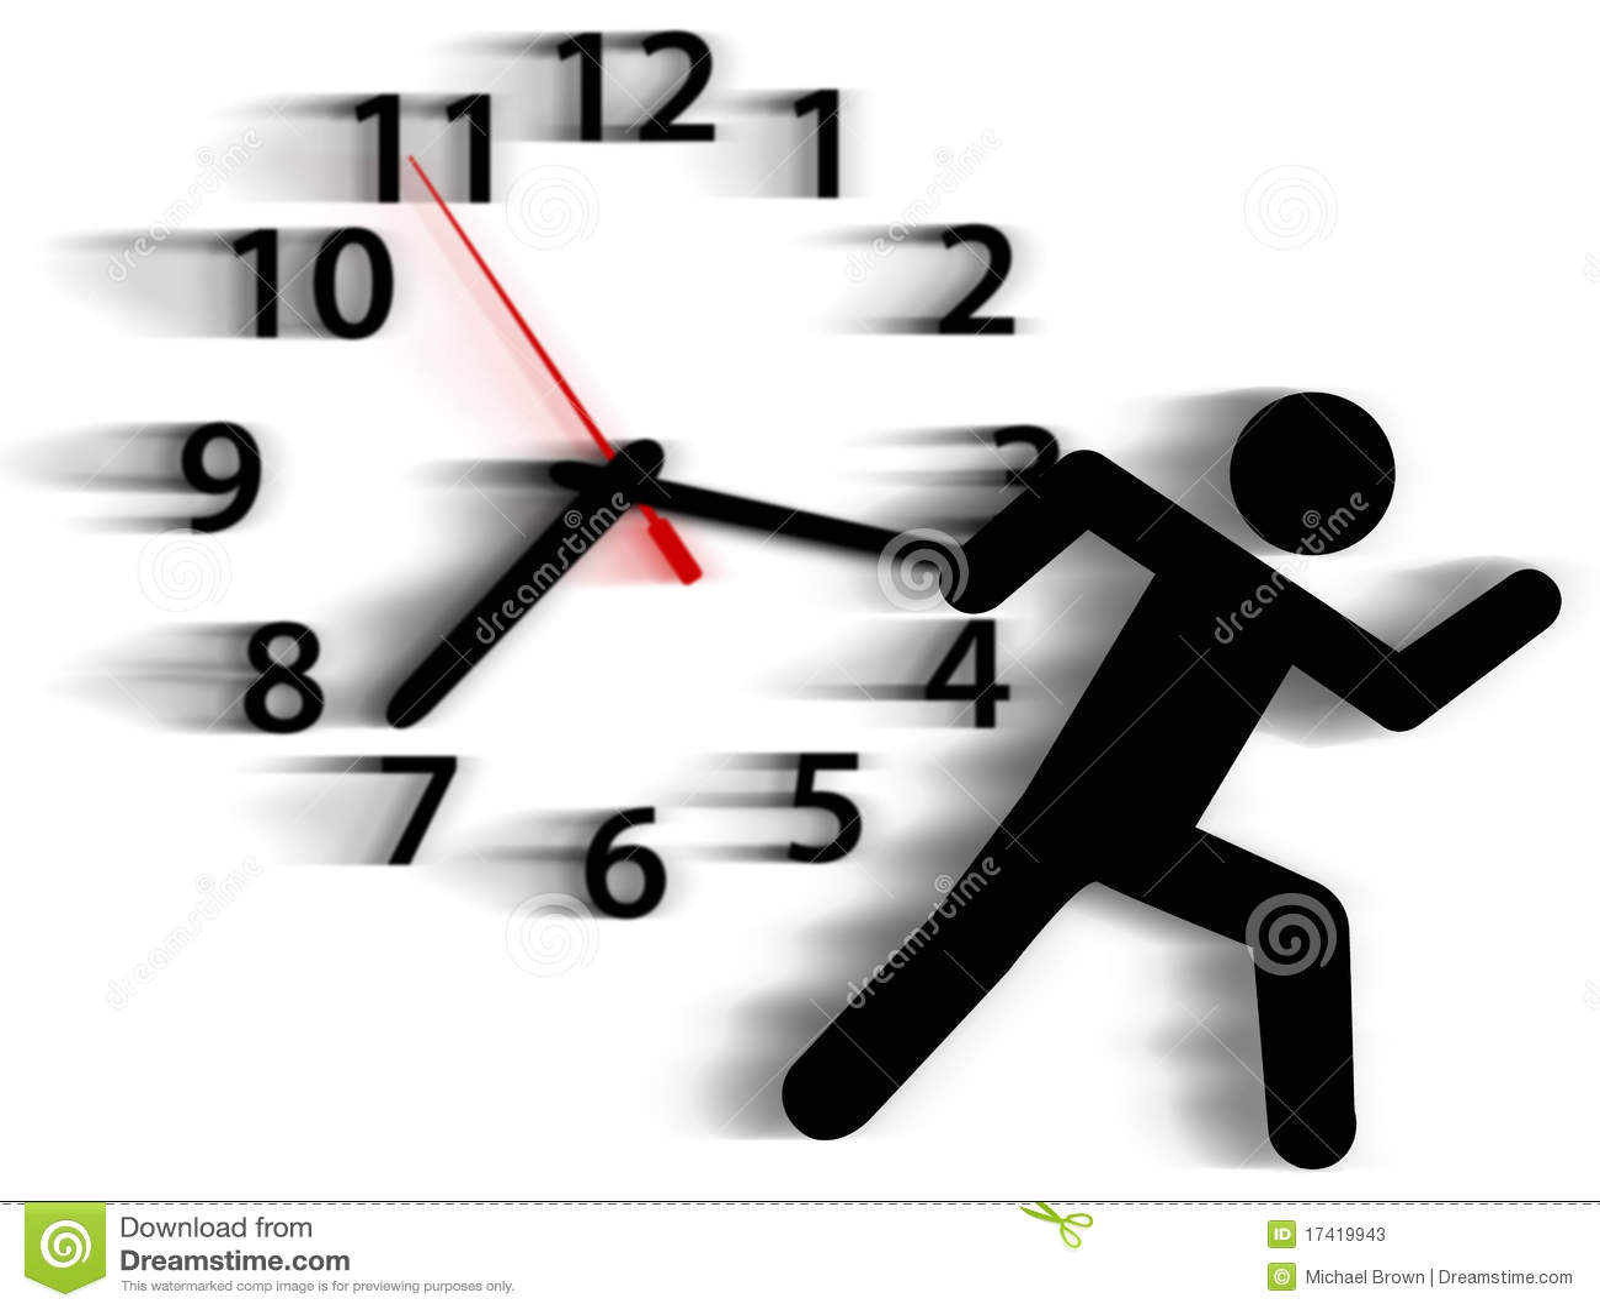 Person Symbol Run Time Race Against Clock Stock Photos